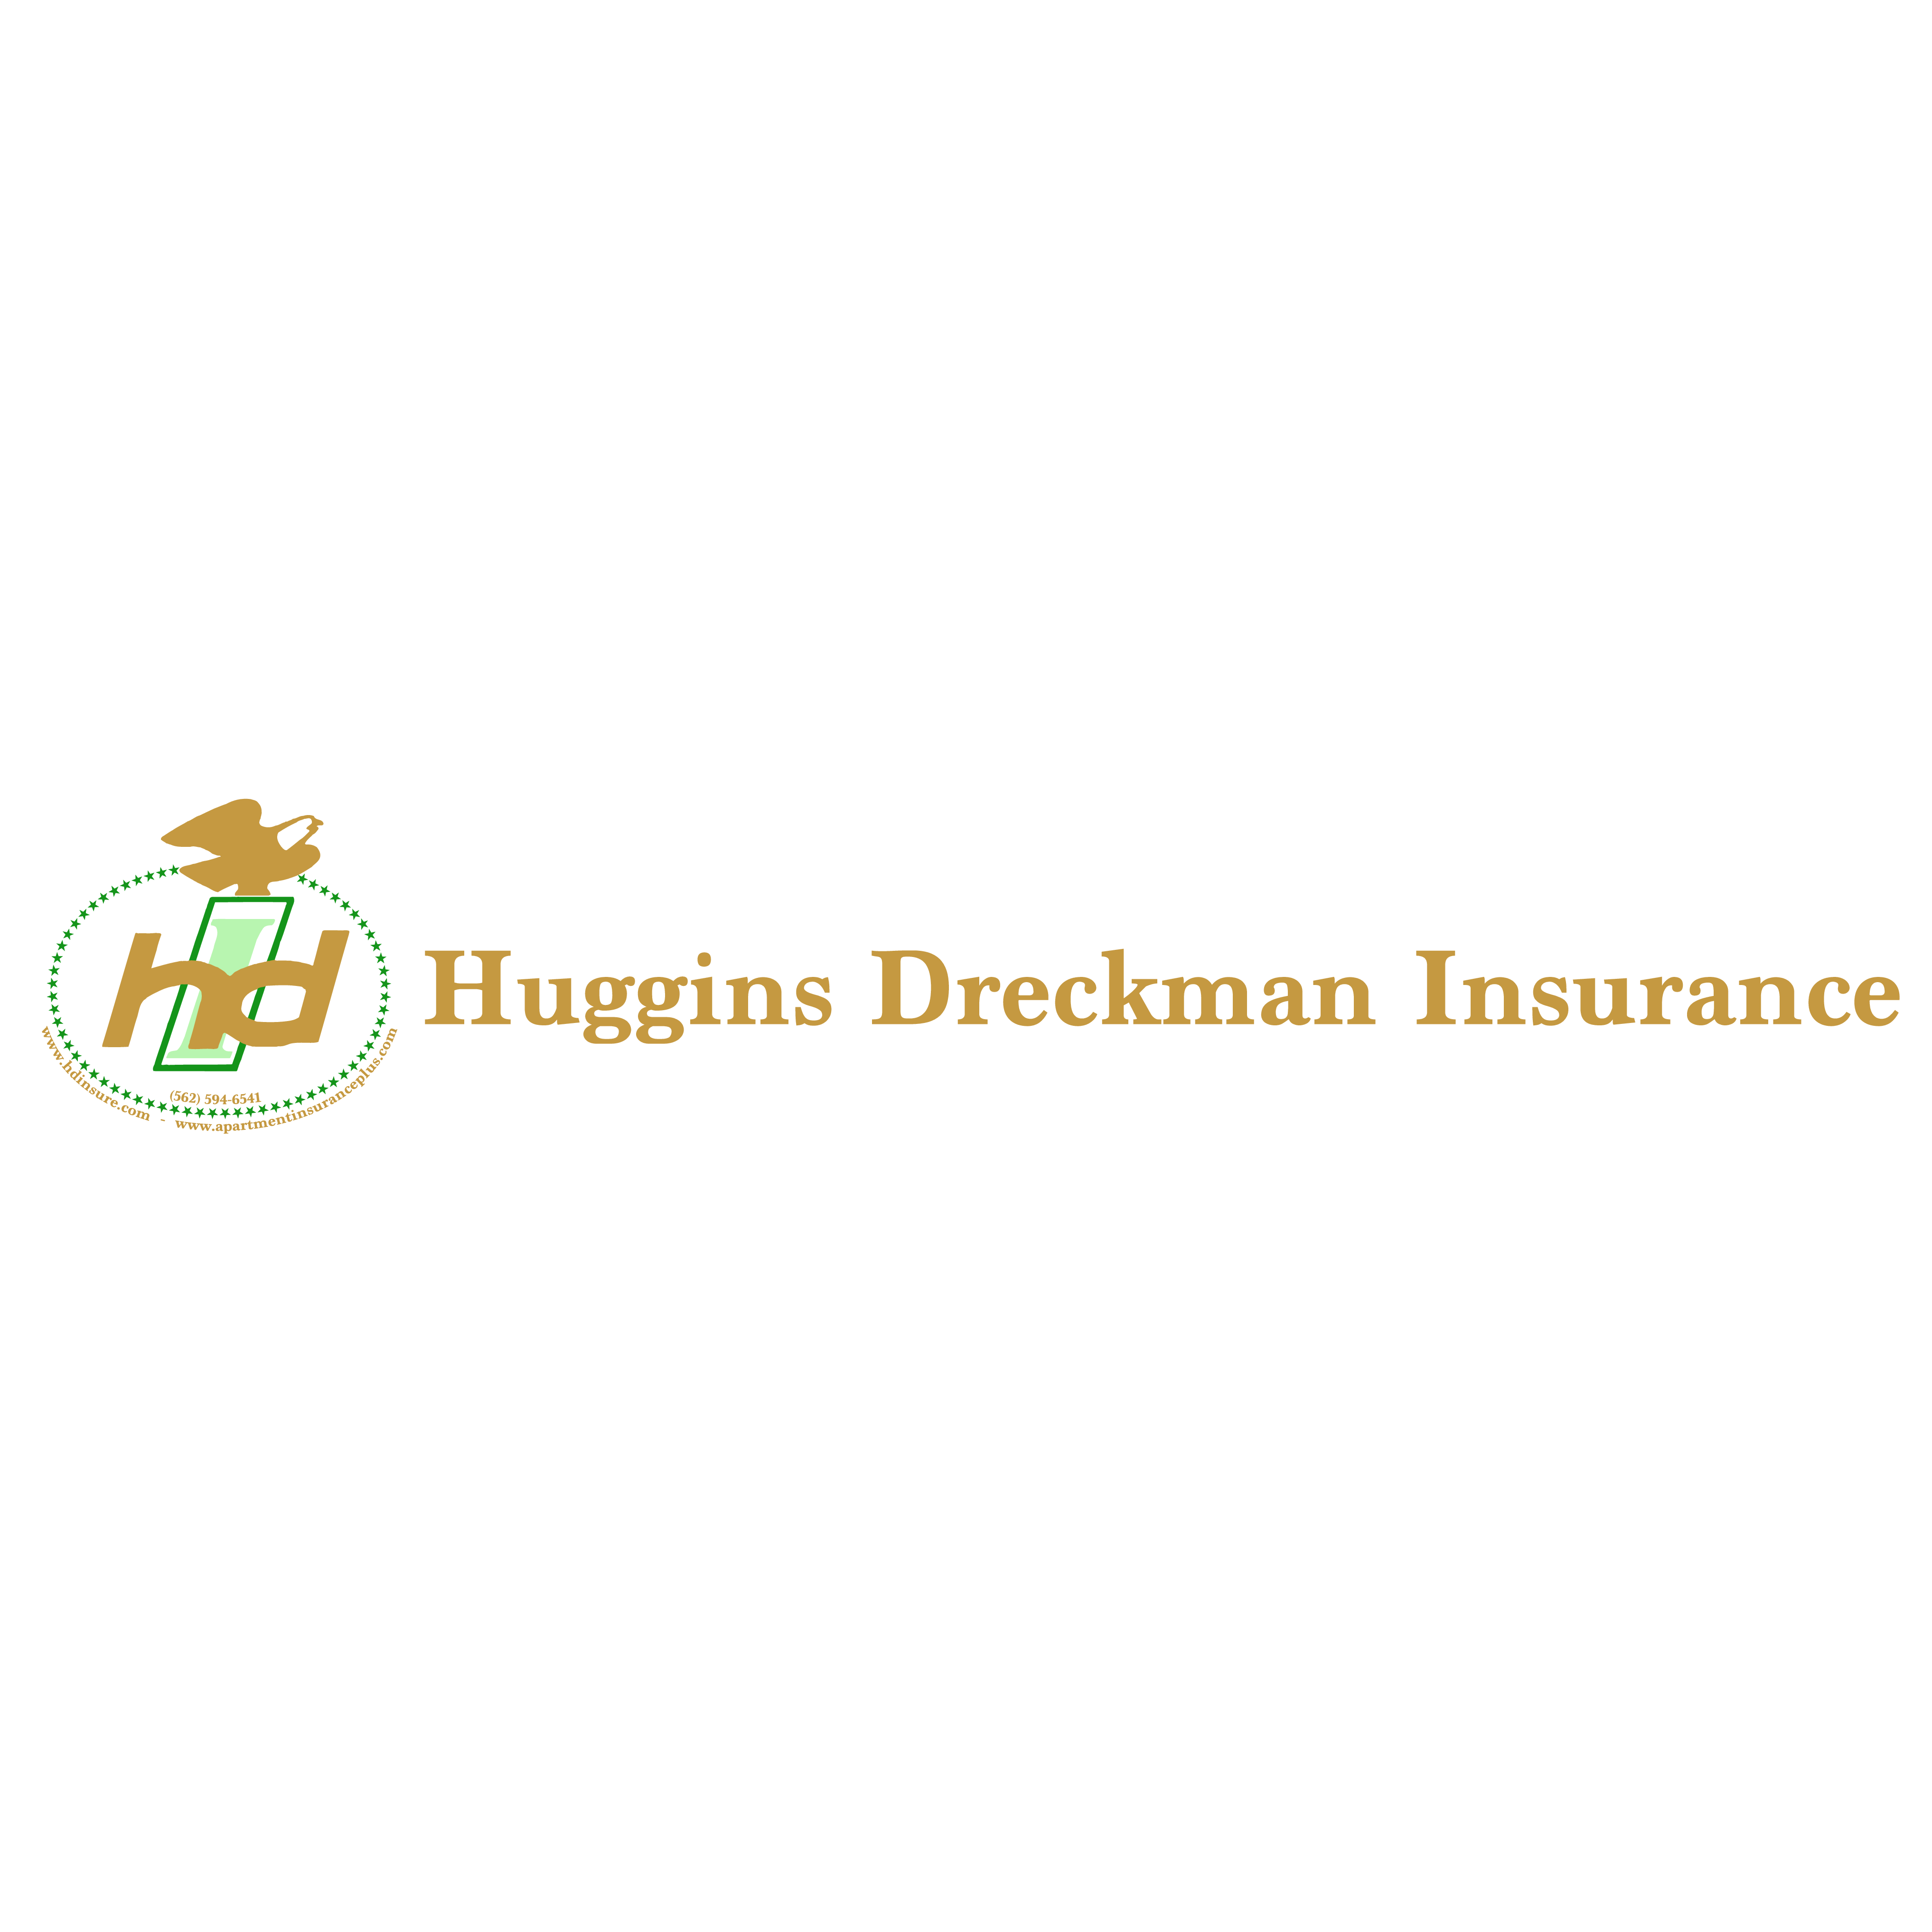 Huggins Dreckman Insurance